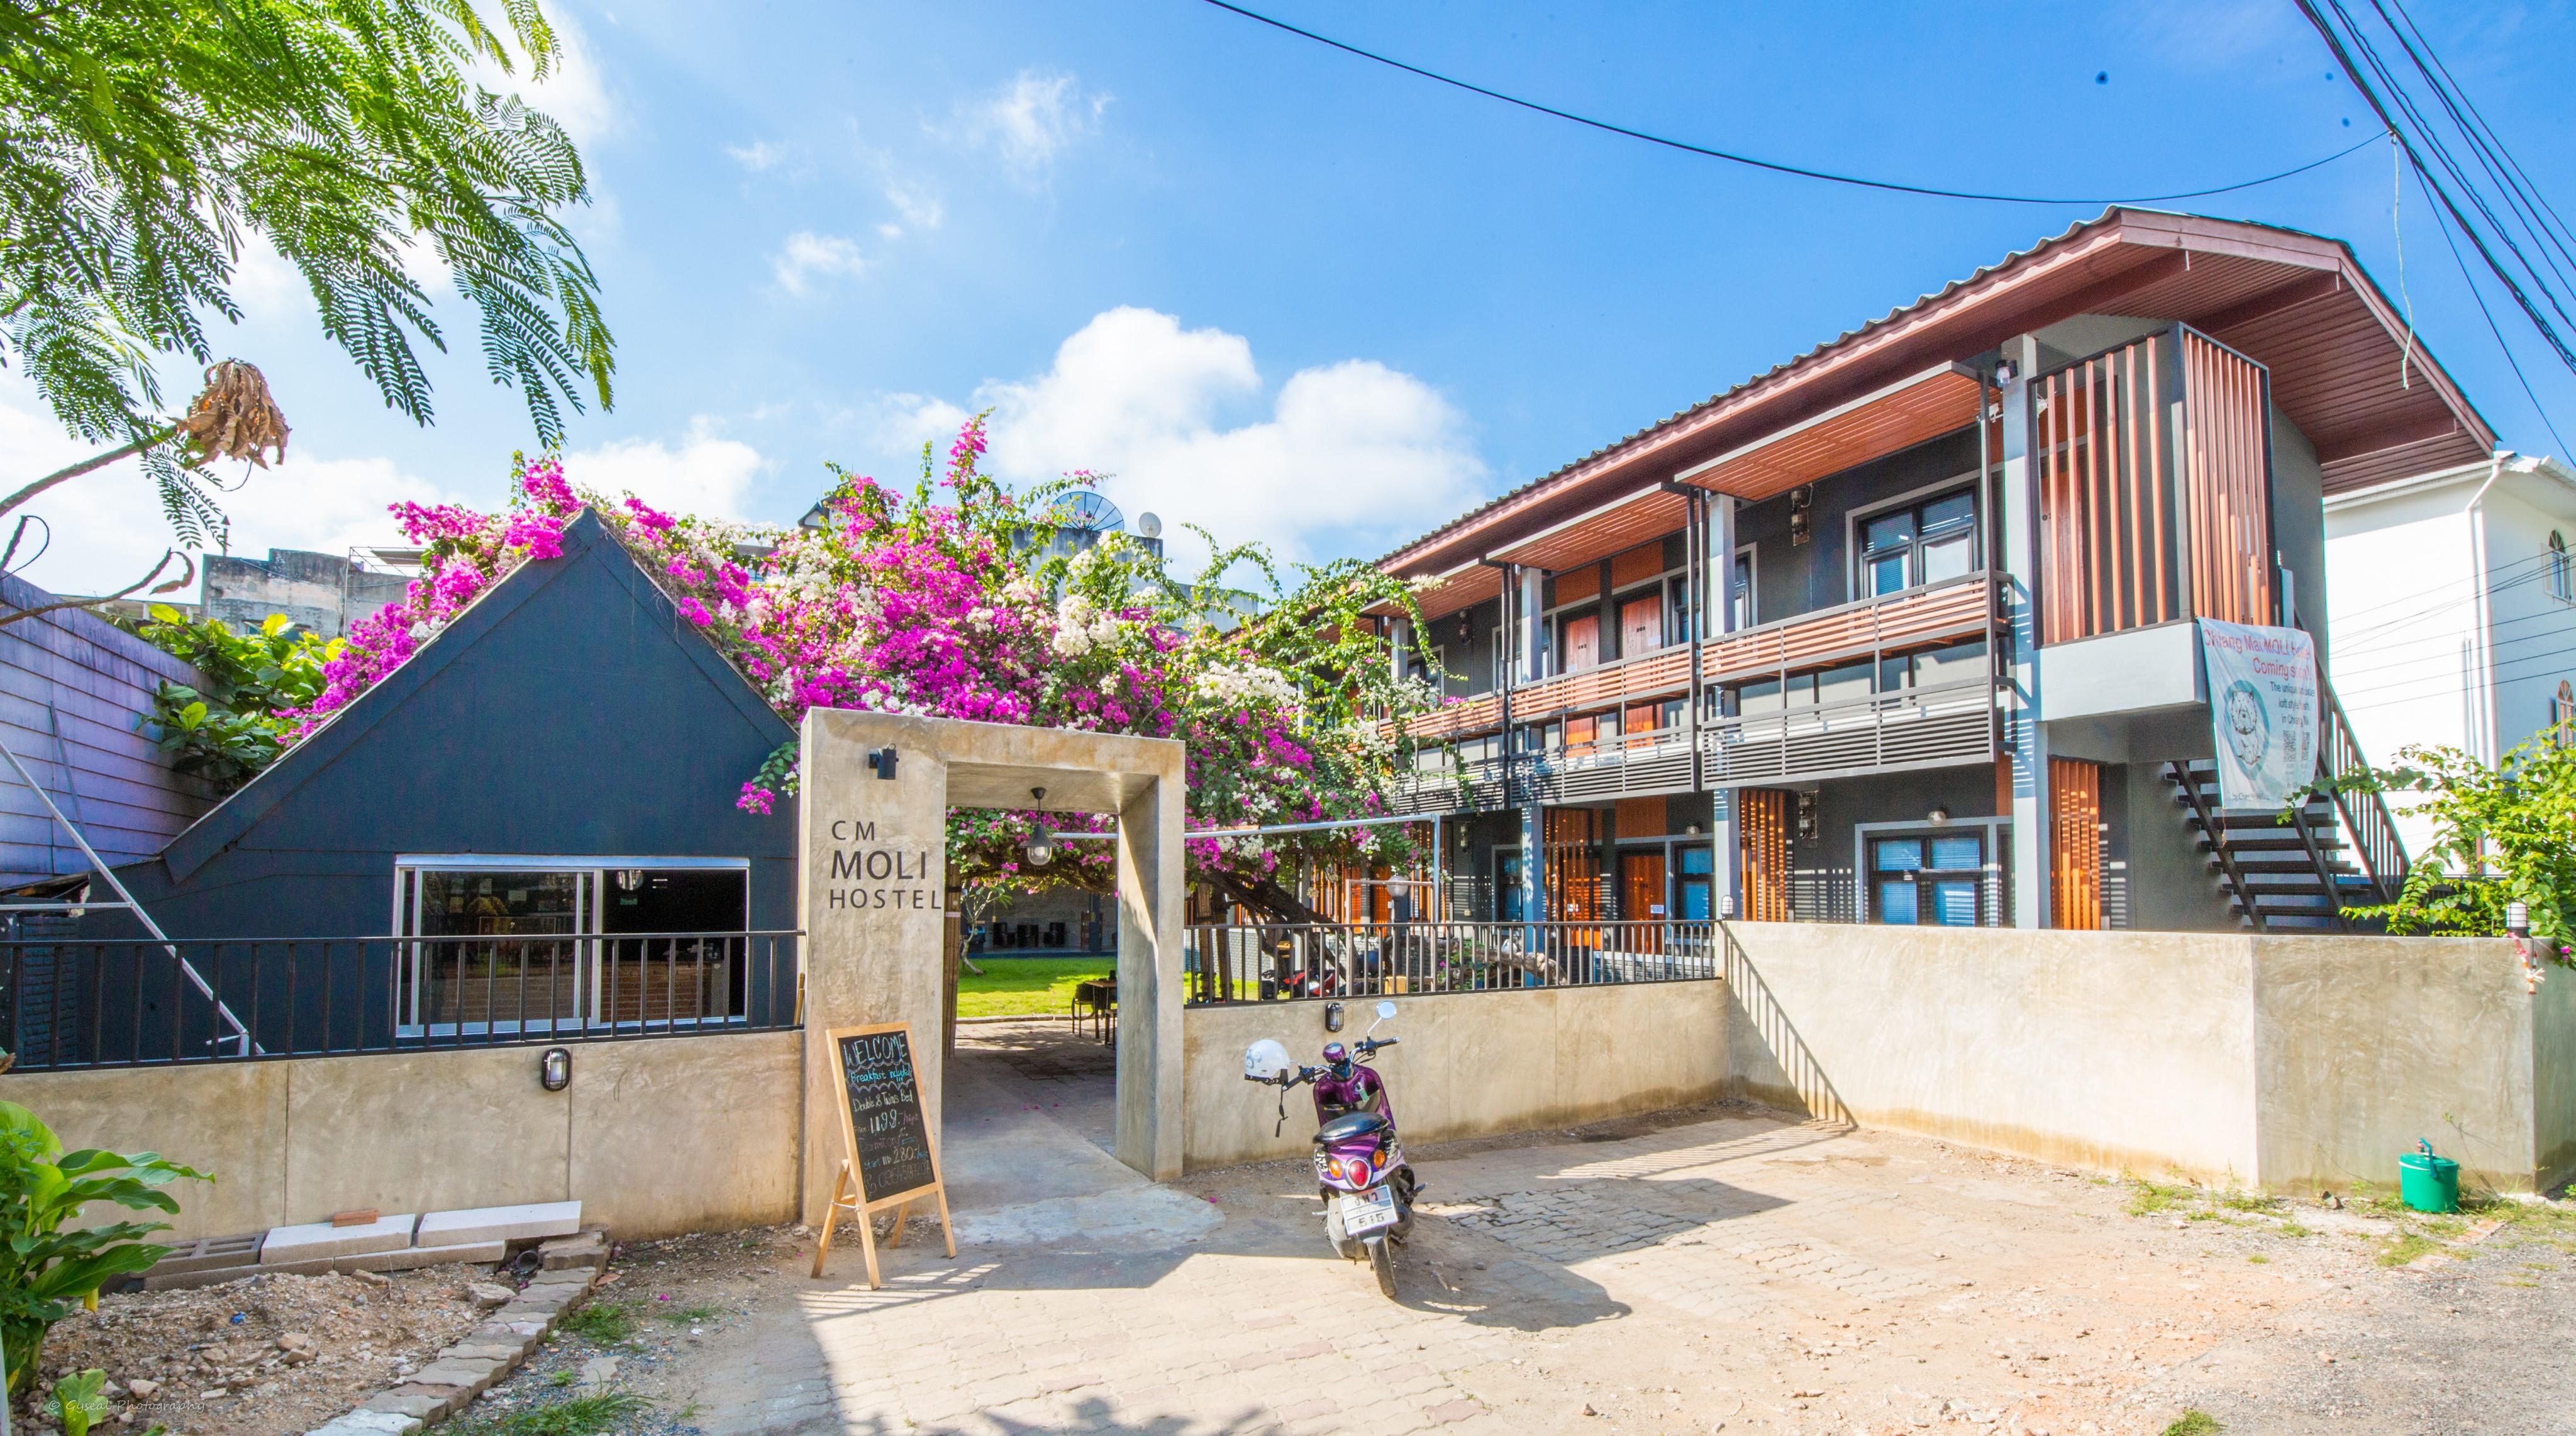 HOSTEL - Chiangmai Moli Hostel